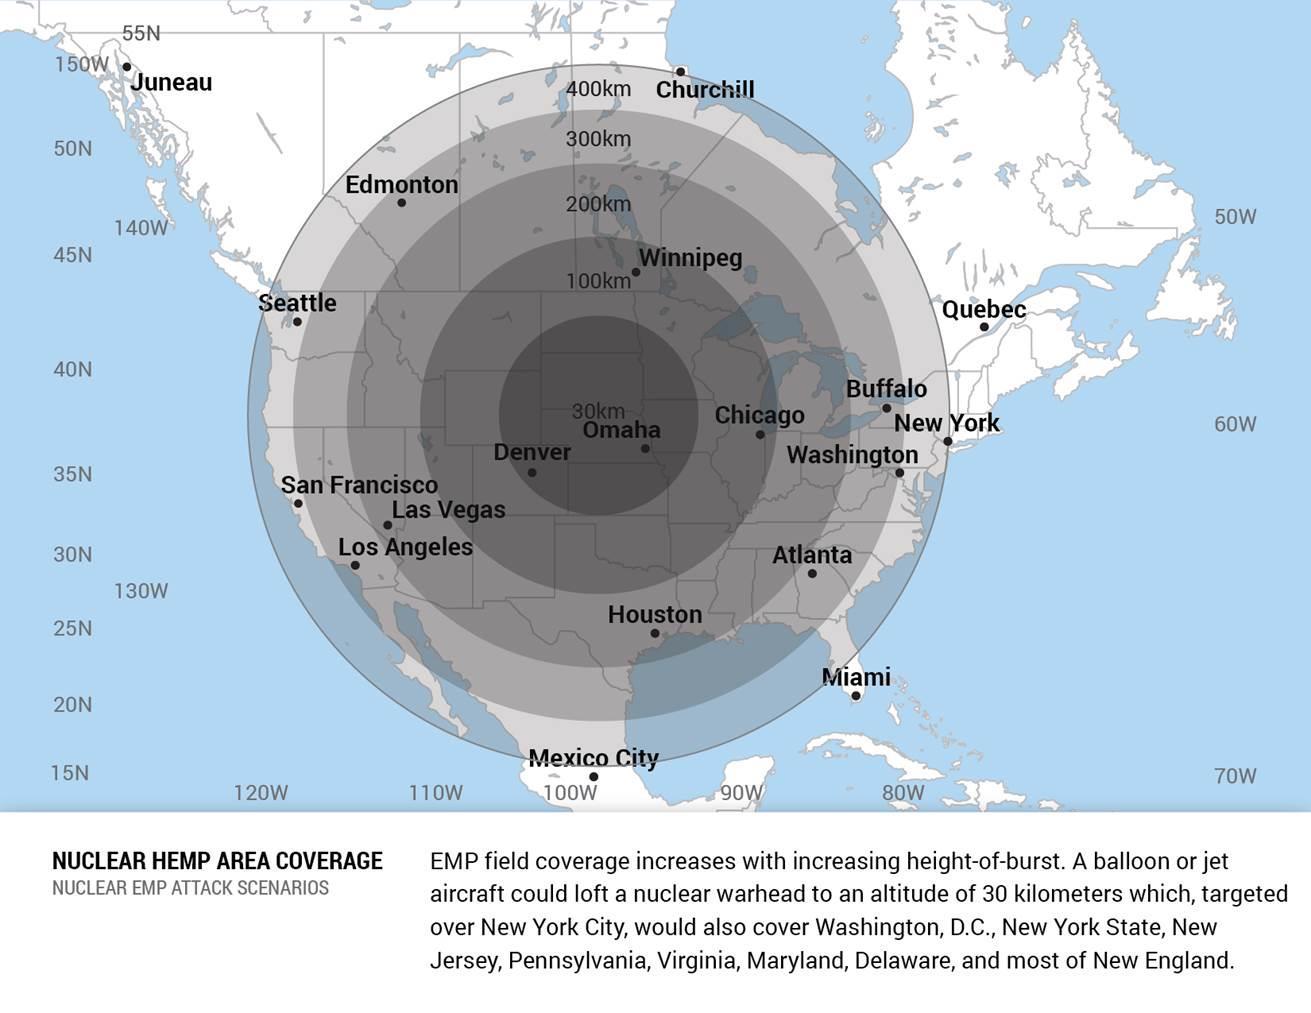 EMP area coverage